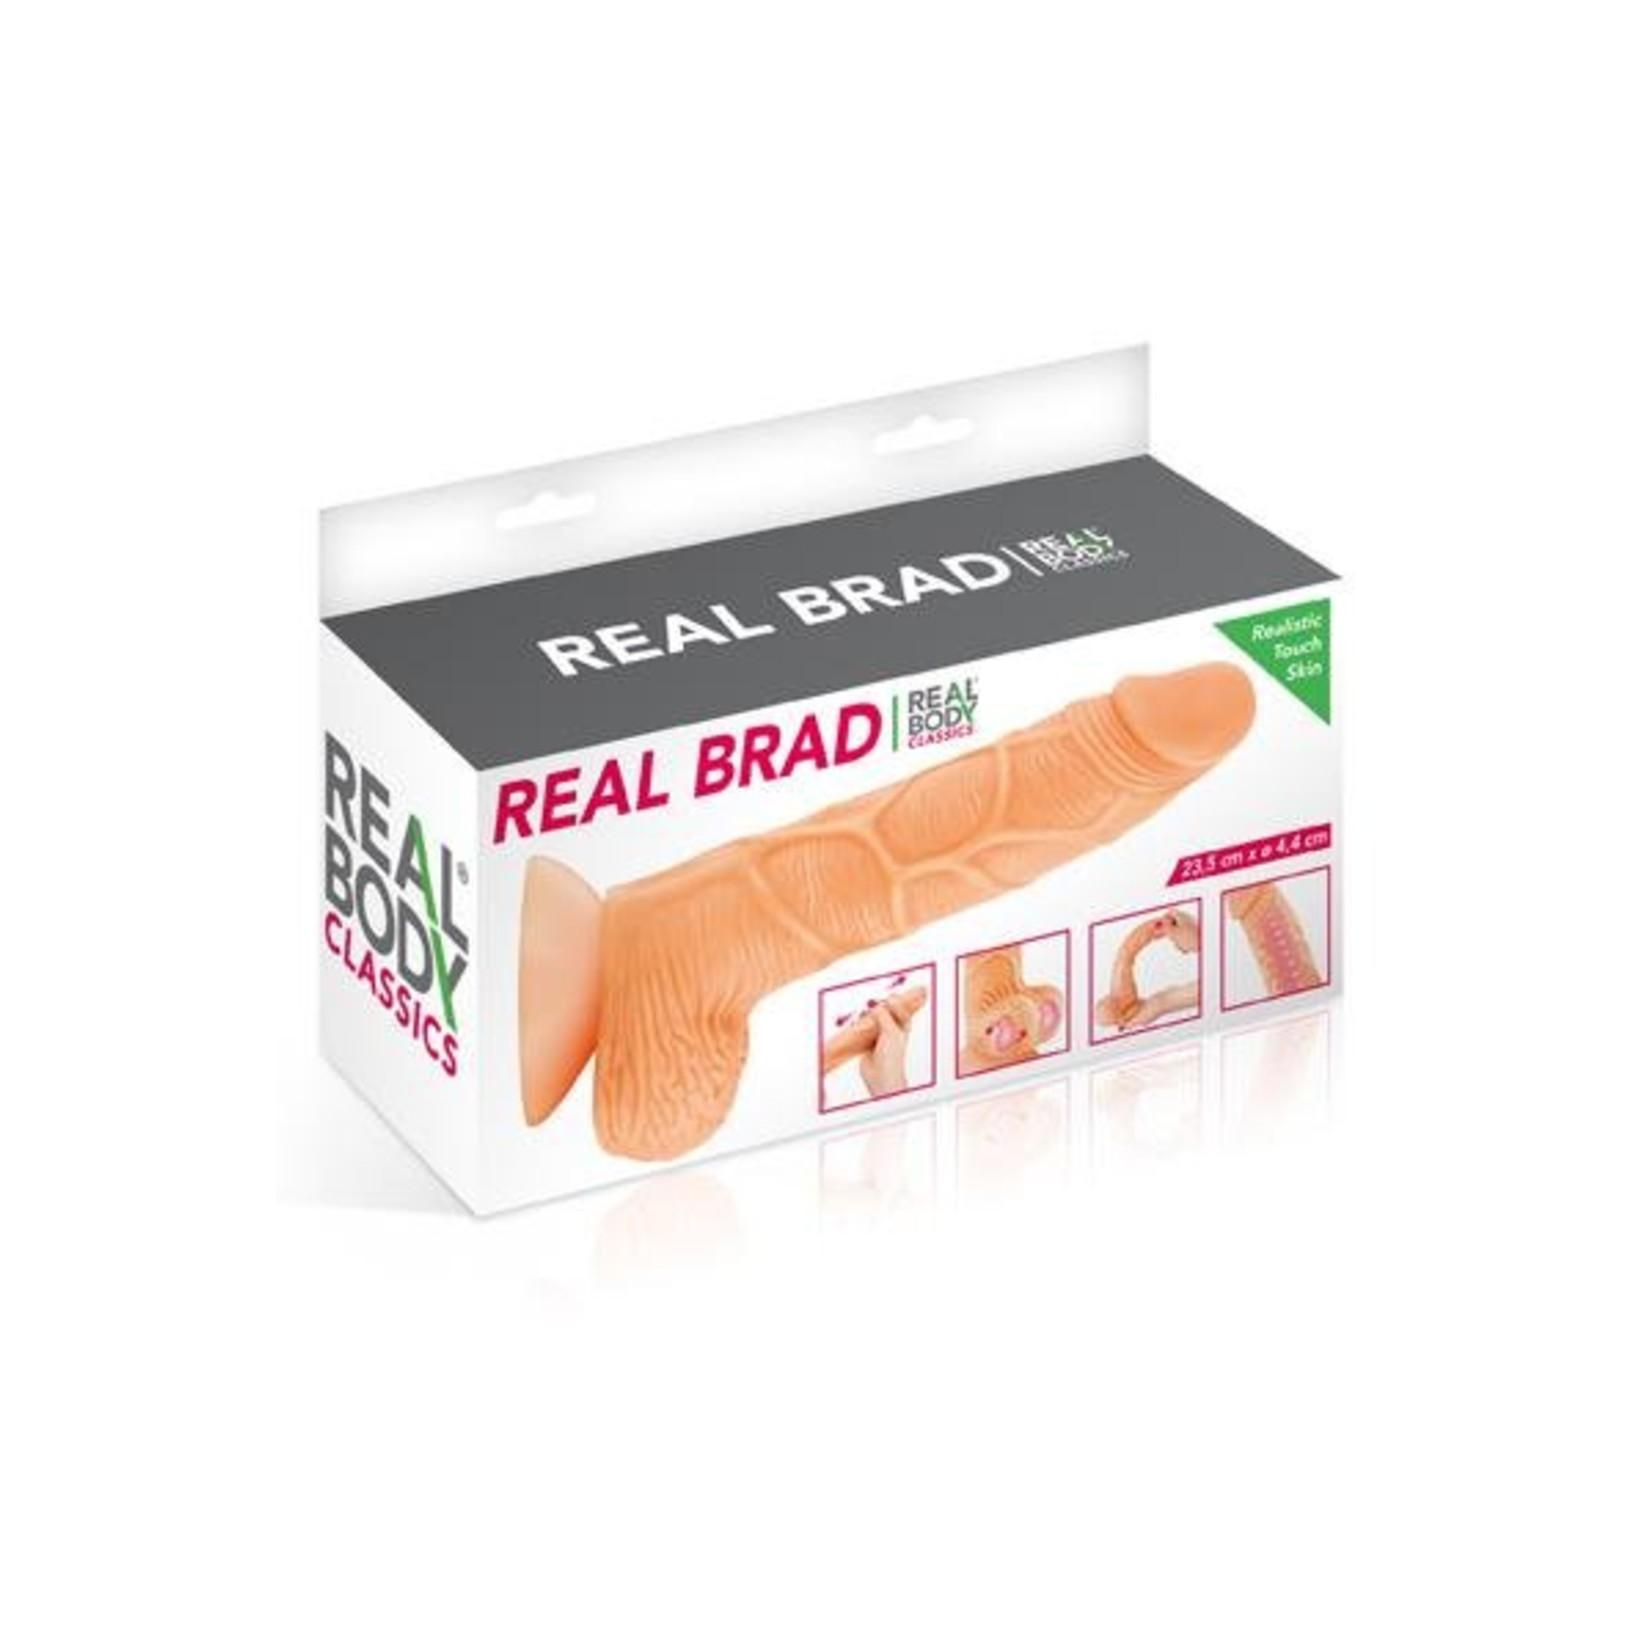 Real Body Gode Realiste Real Body Brad